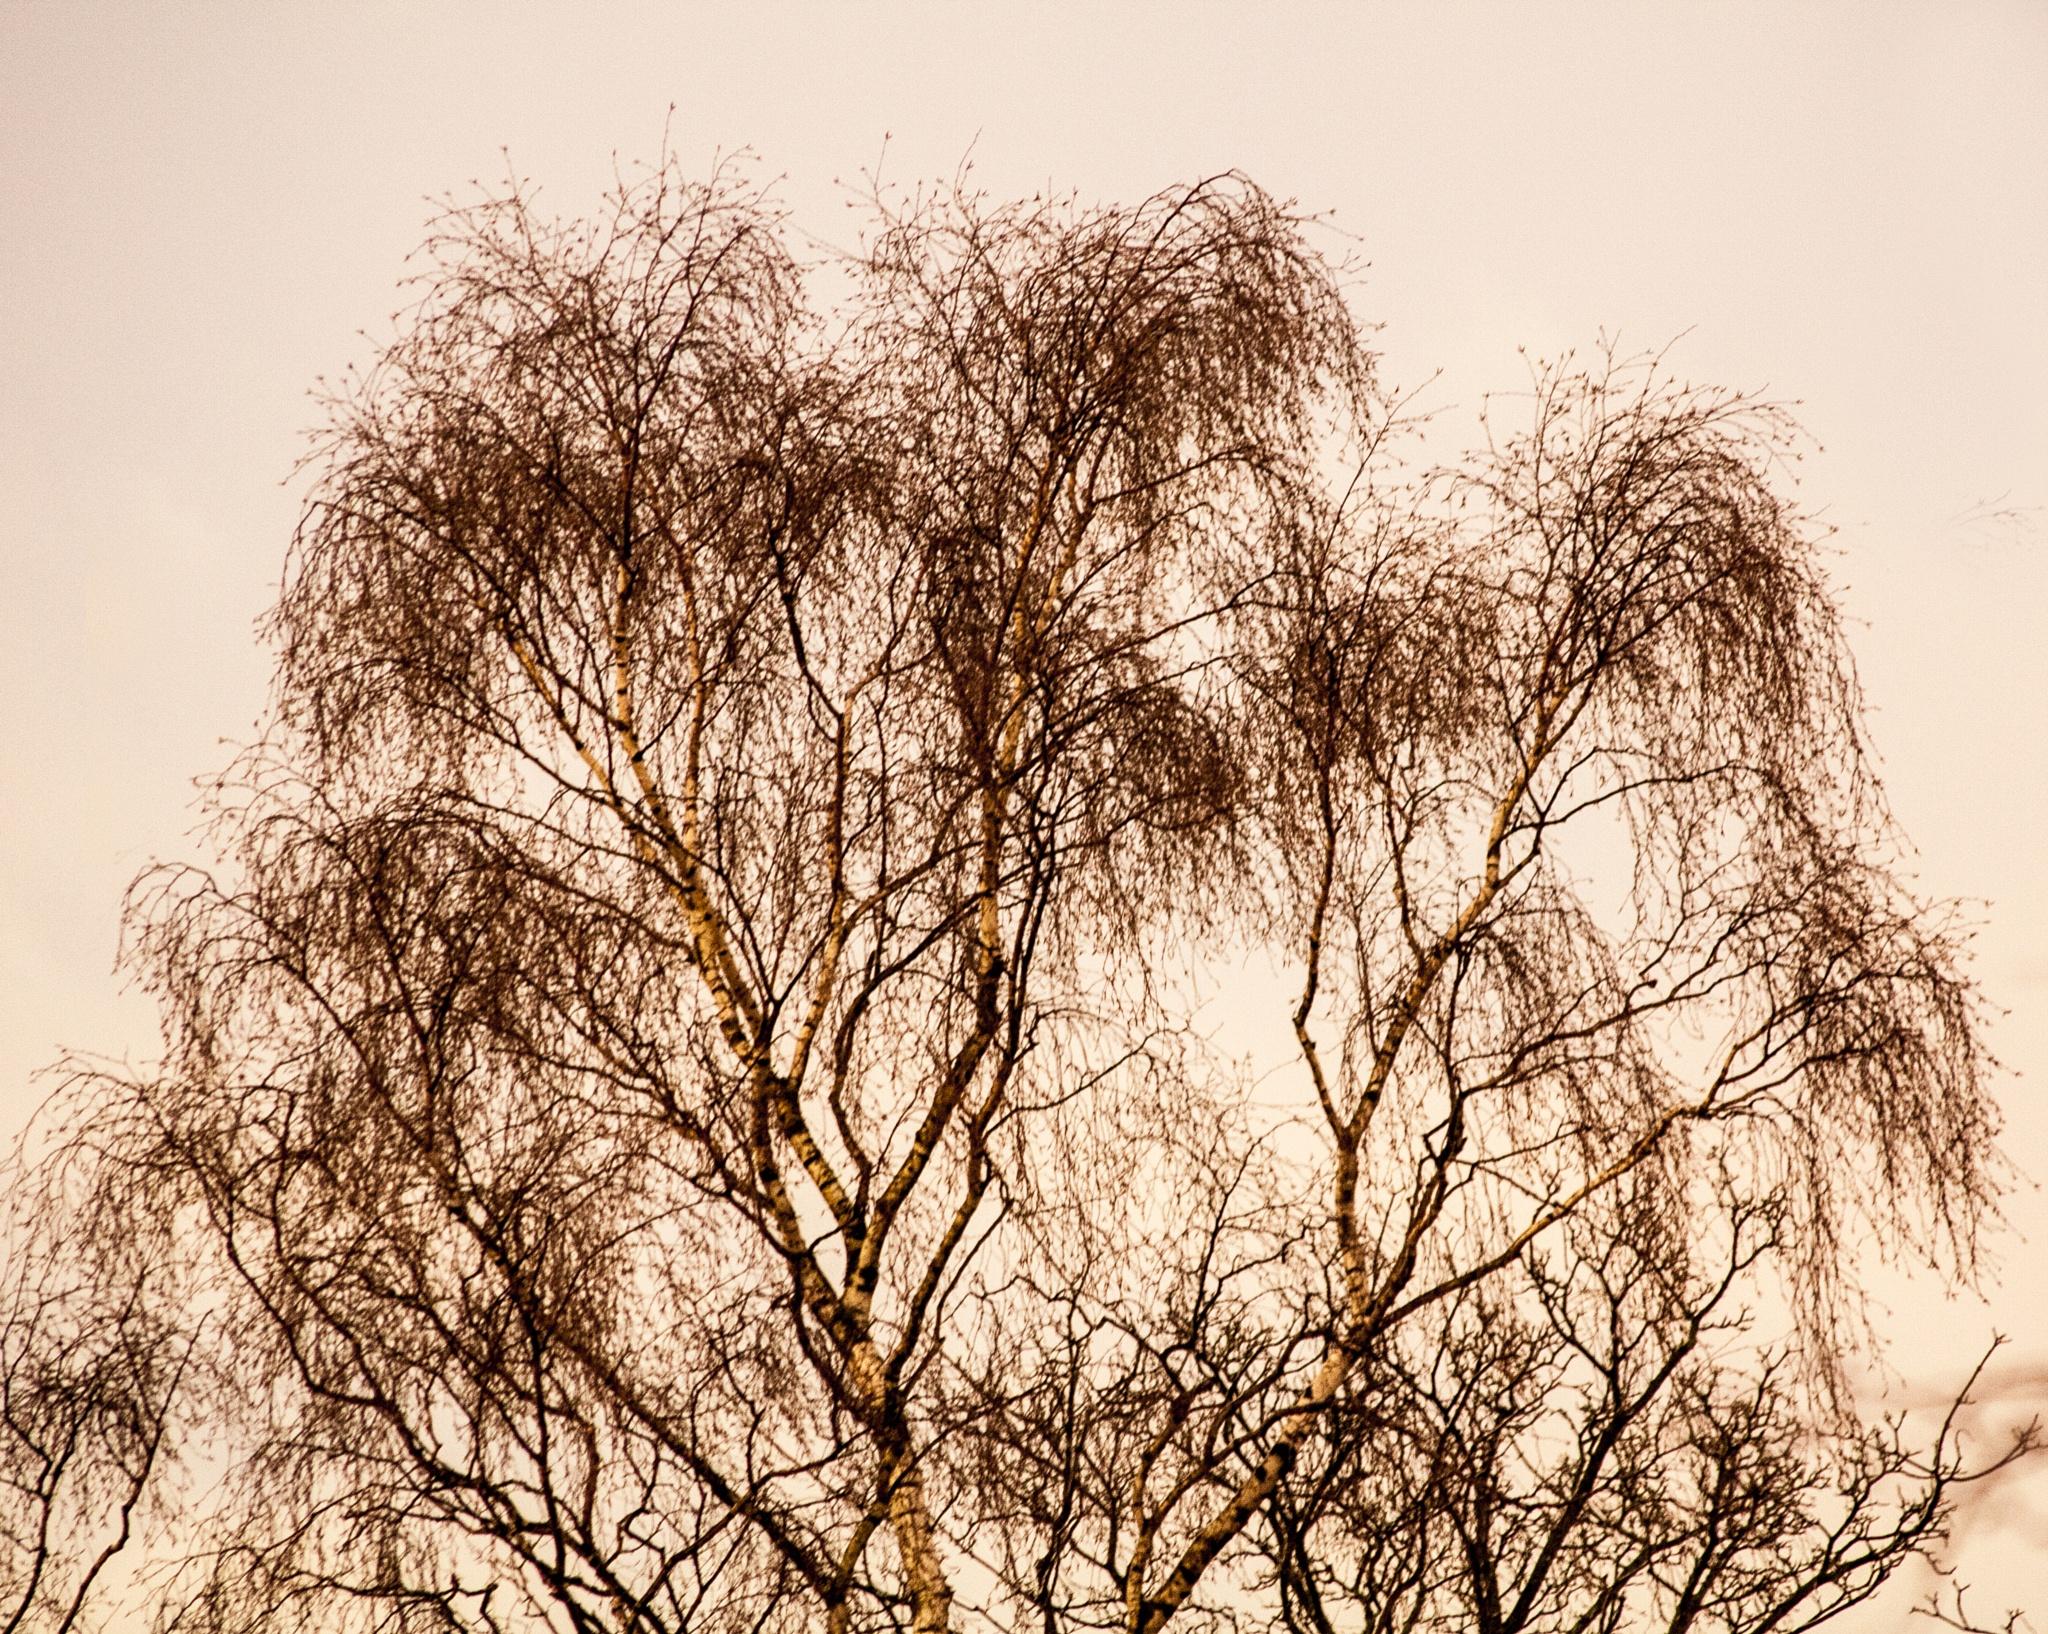 Weeping Tree by martin.davis.5243817